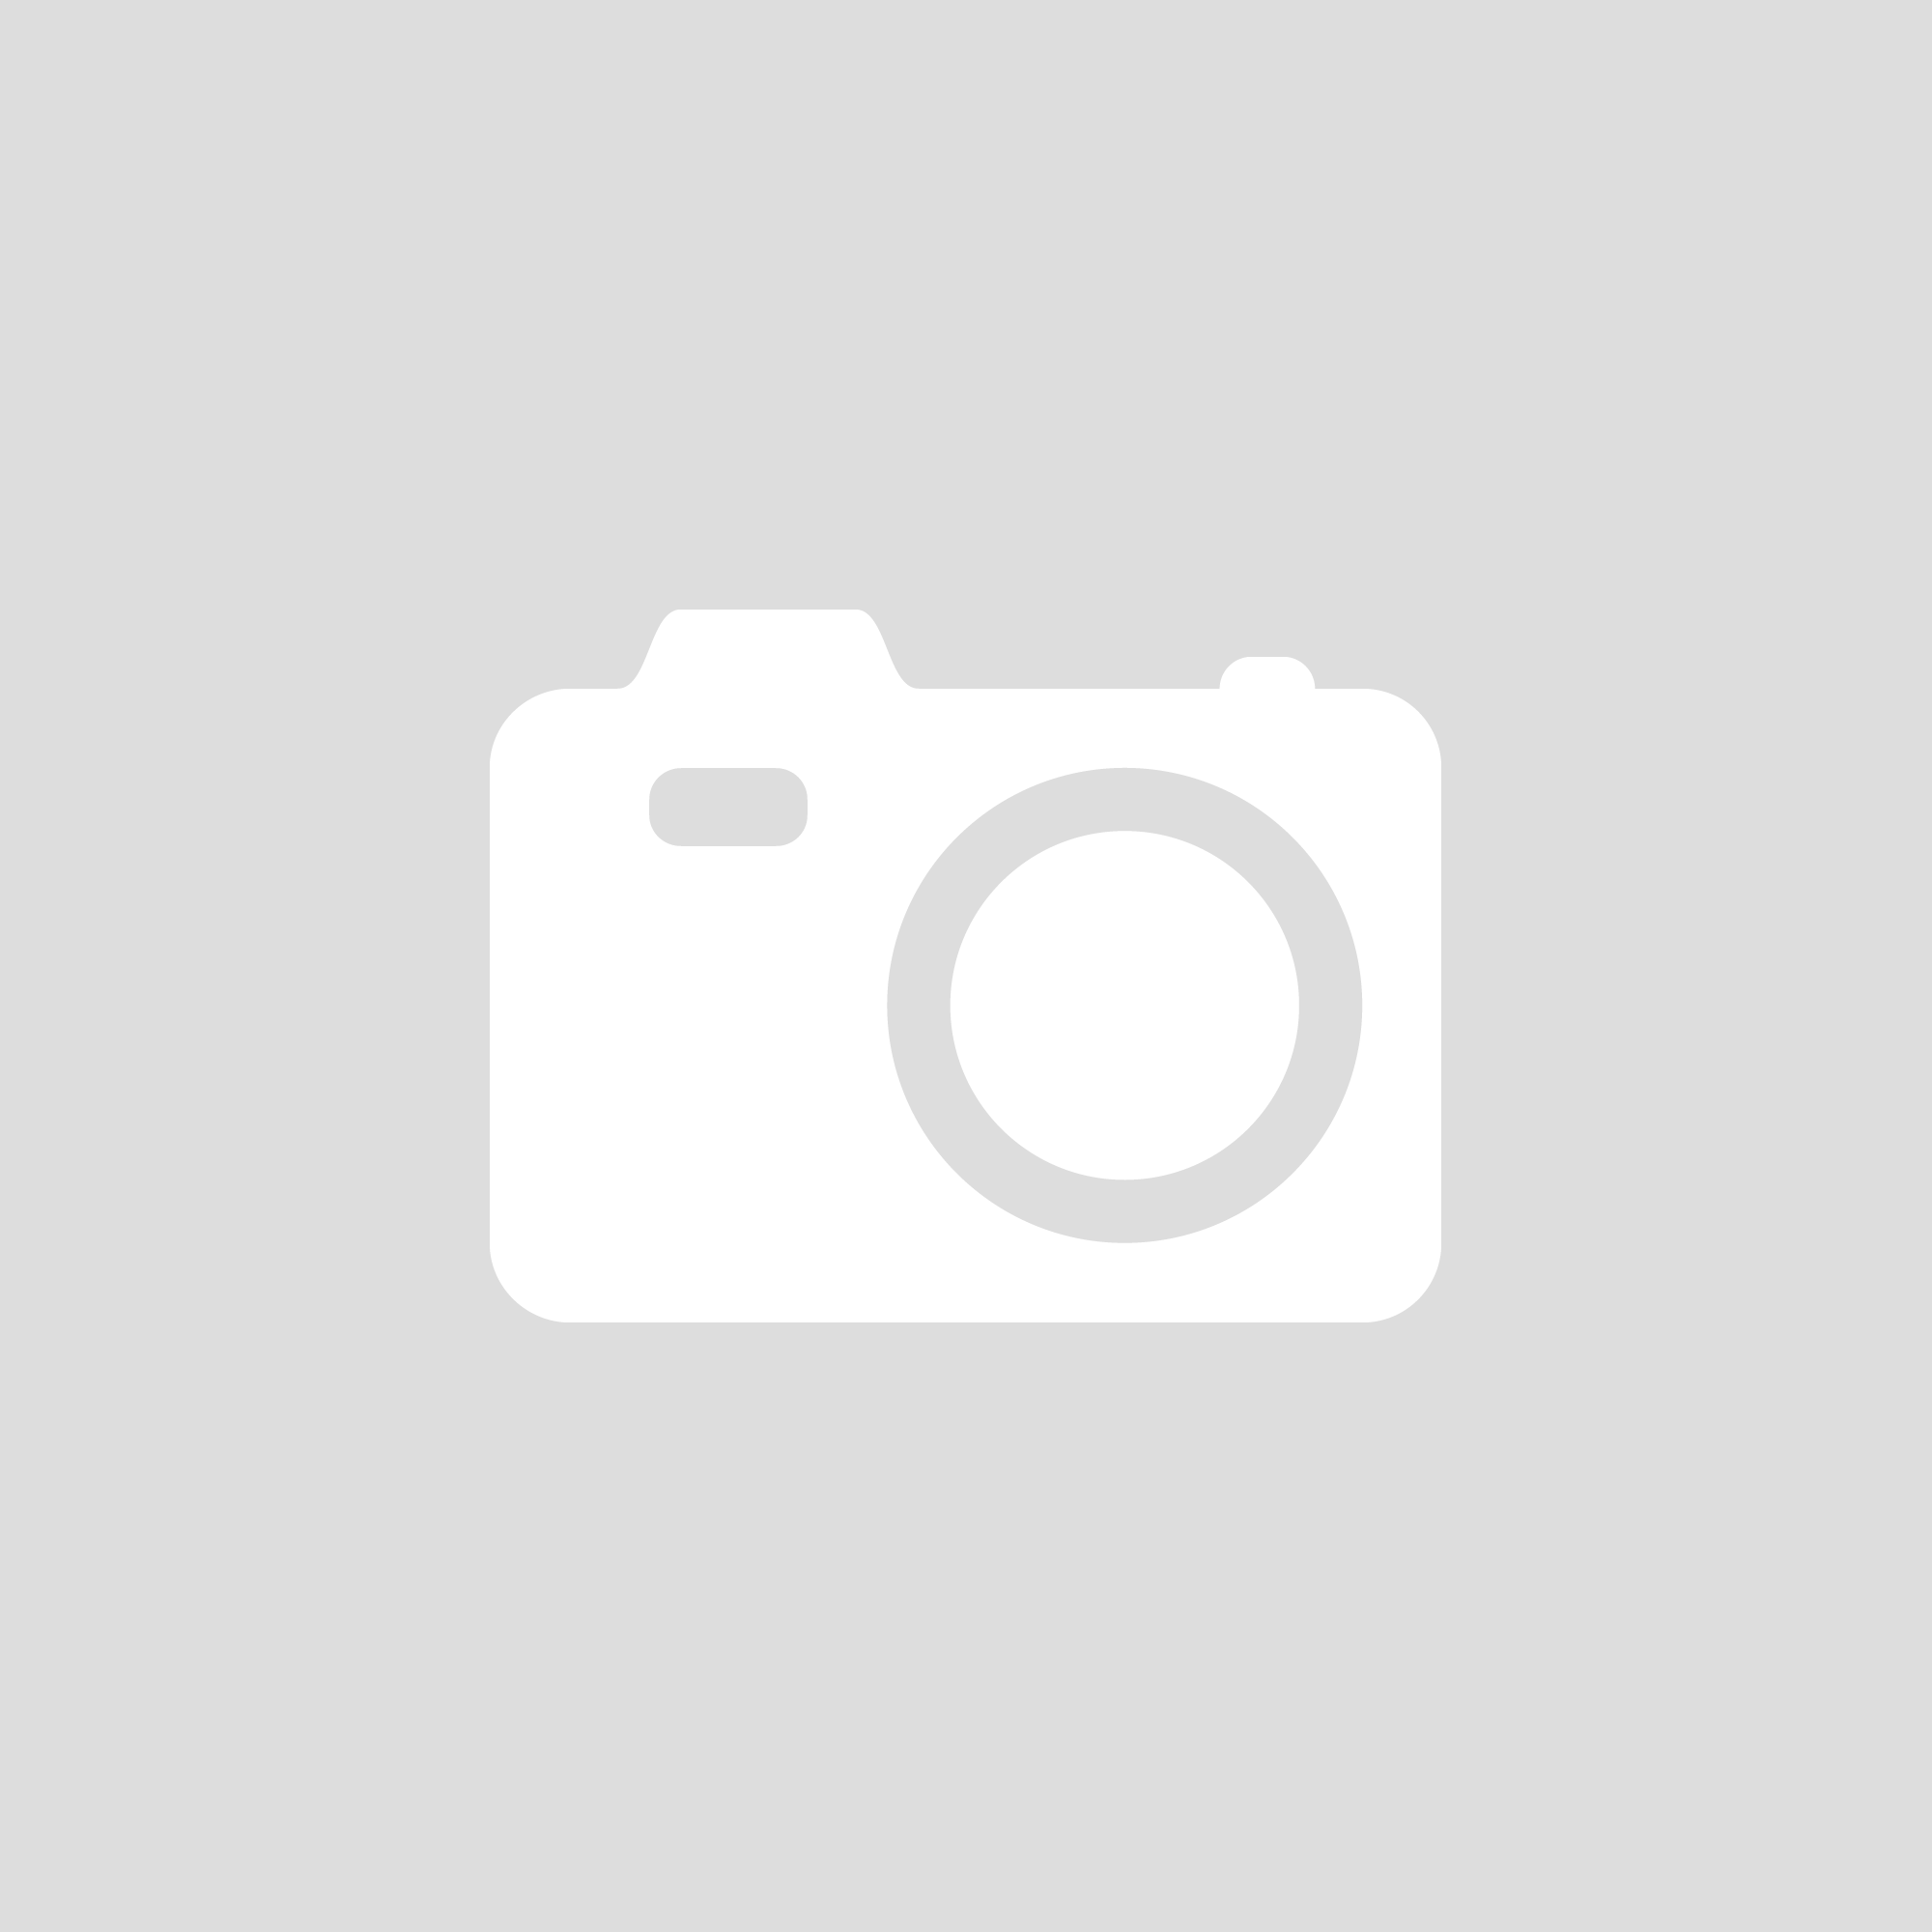 Sensation Plain Charcoal Wallpaper by GranDeco 227218